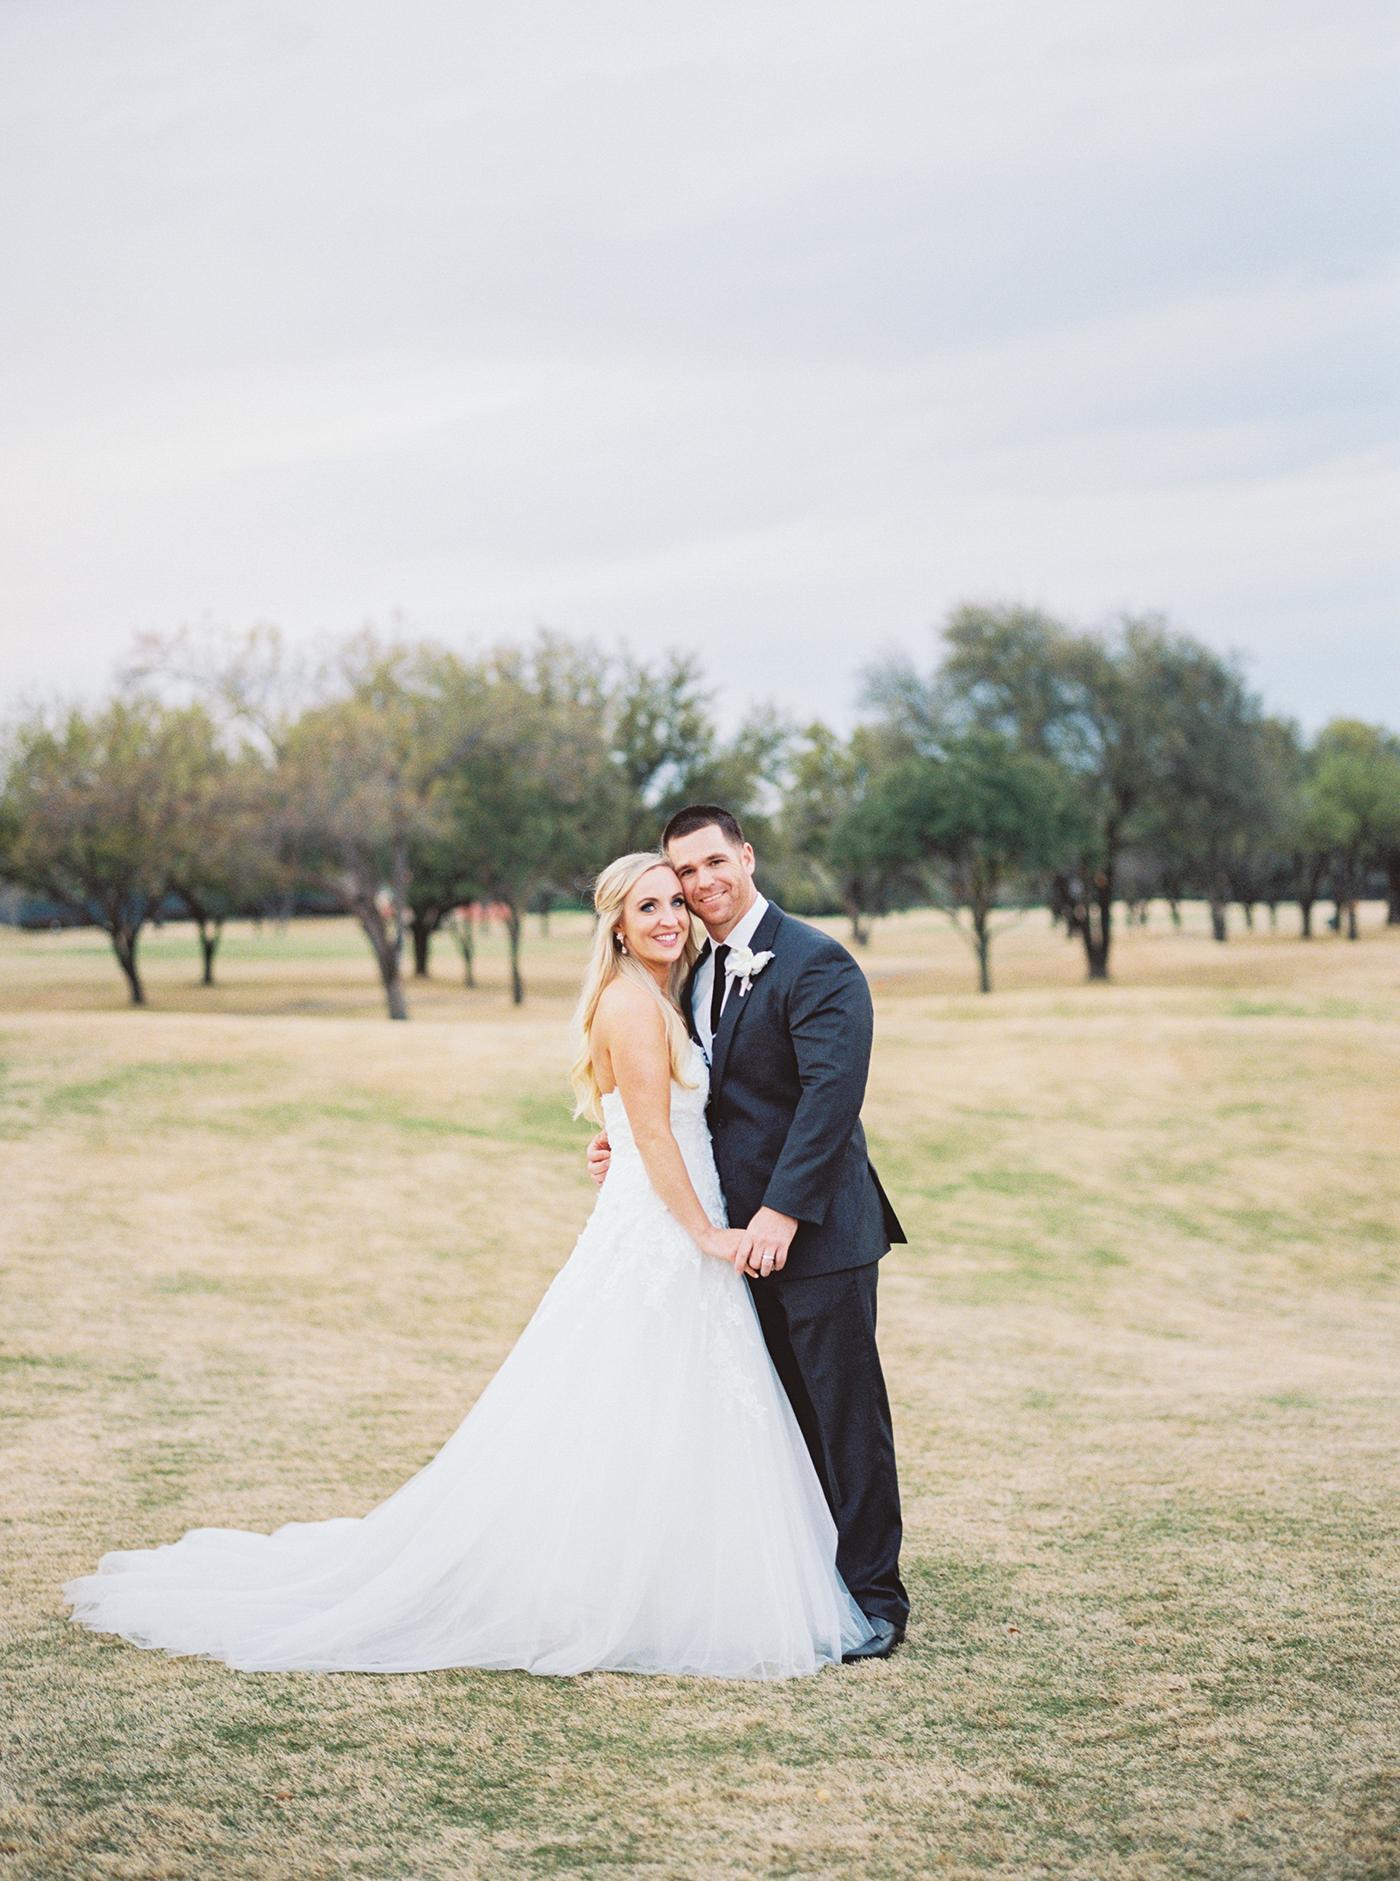 DFW Wedding Planner - Caroline + Jeff at The Four Seasons Hotel Wedding - Allday Events - 131.jpg